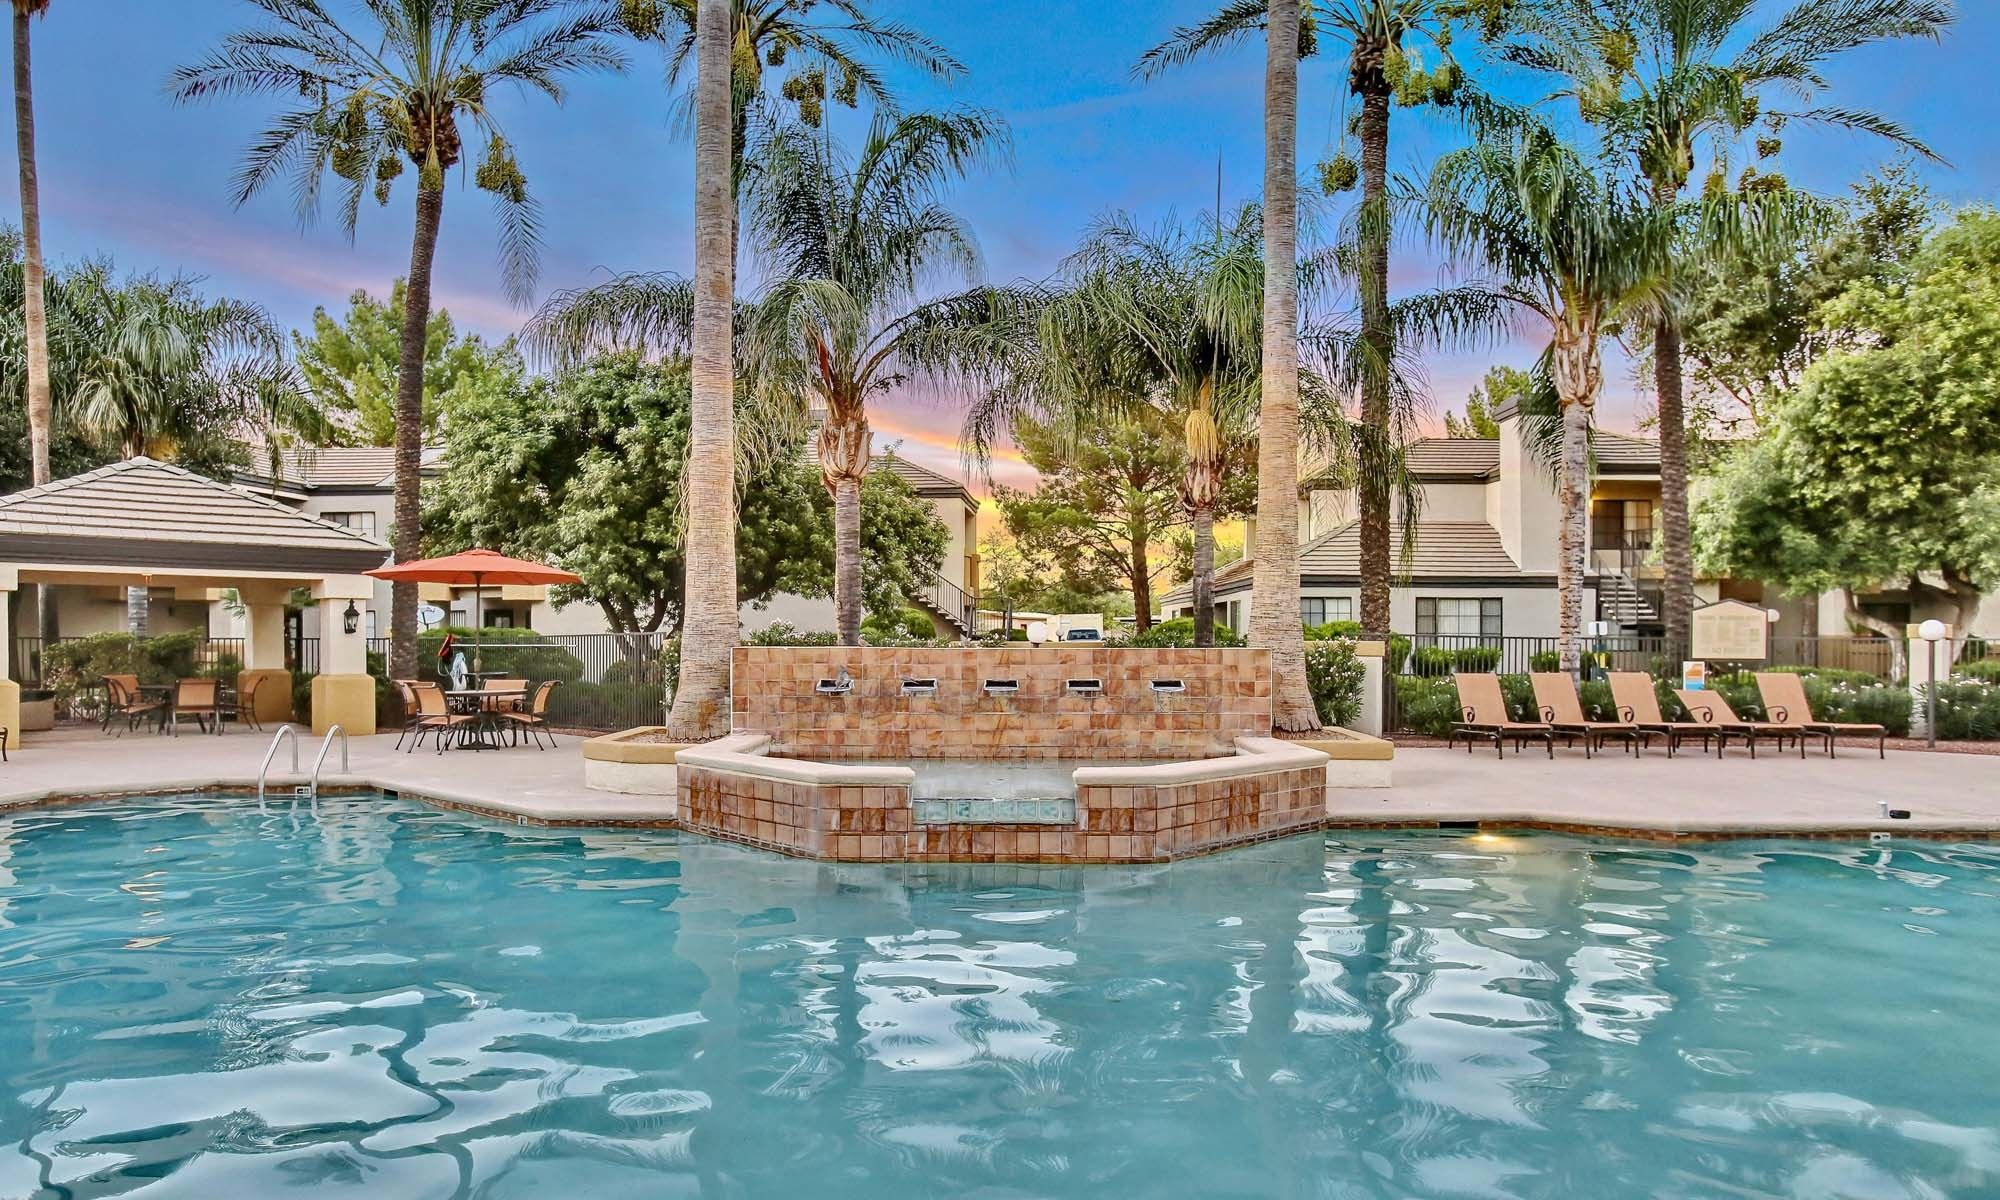 Apartments in Tucson, AZ.